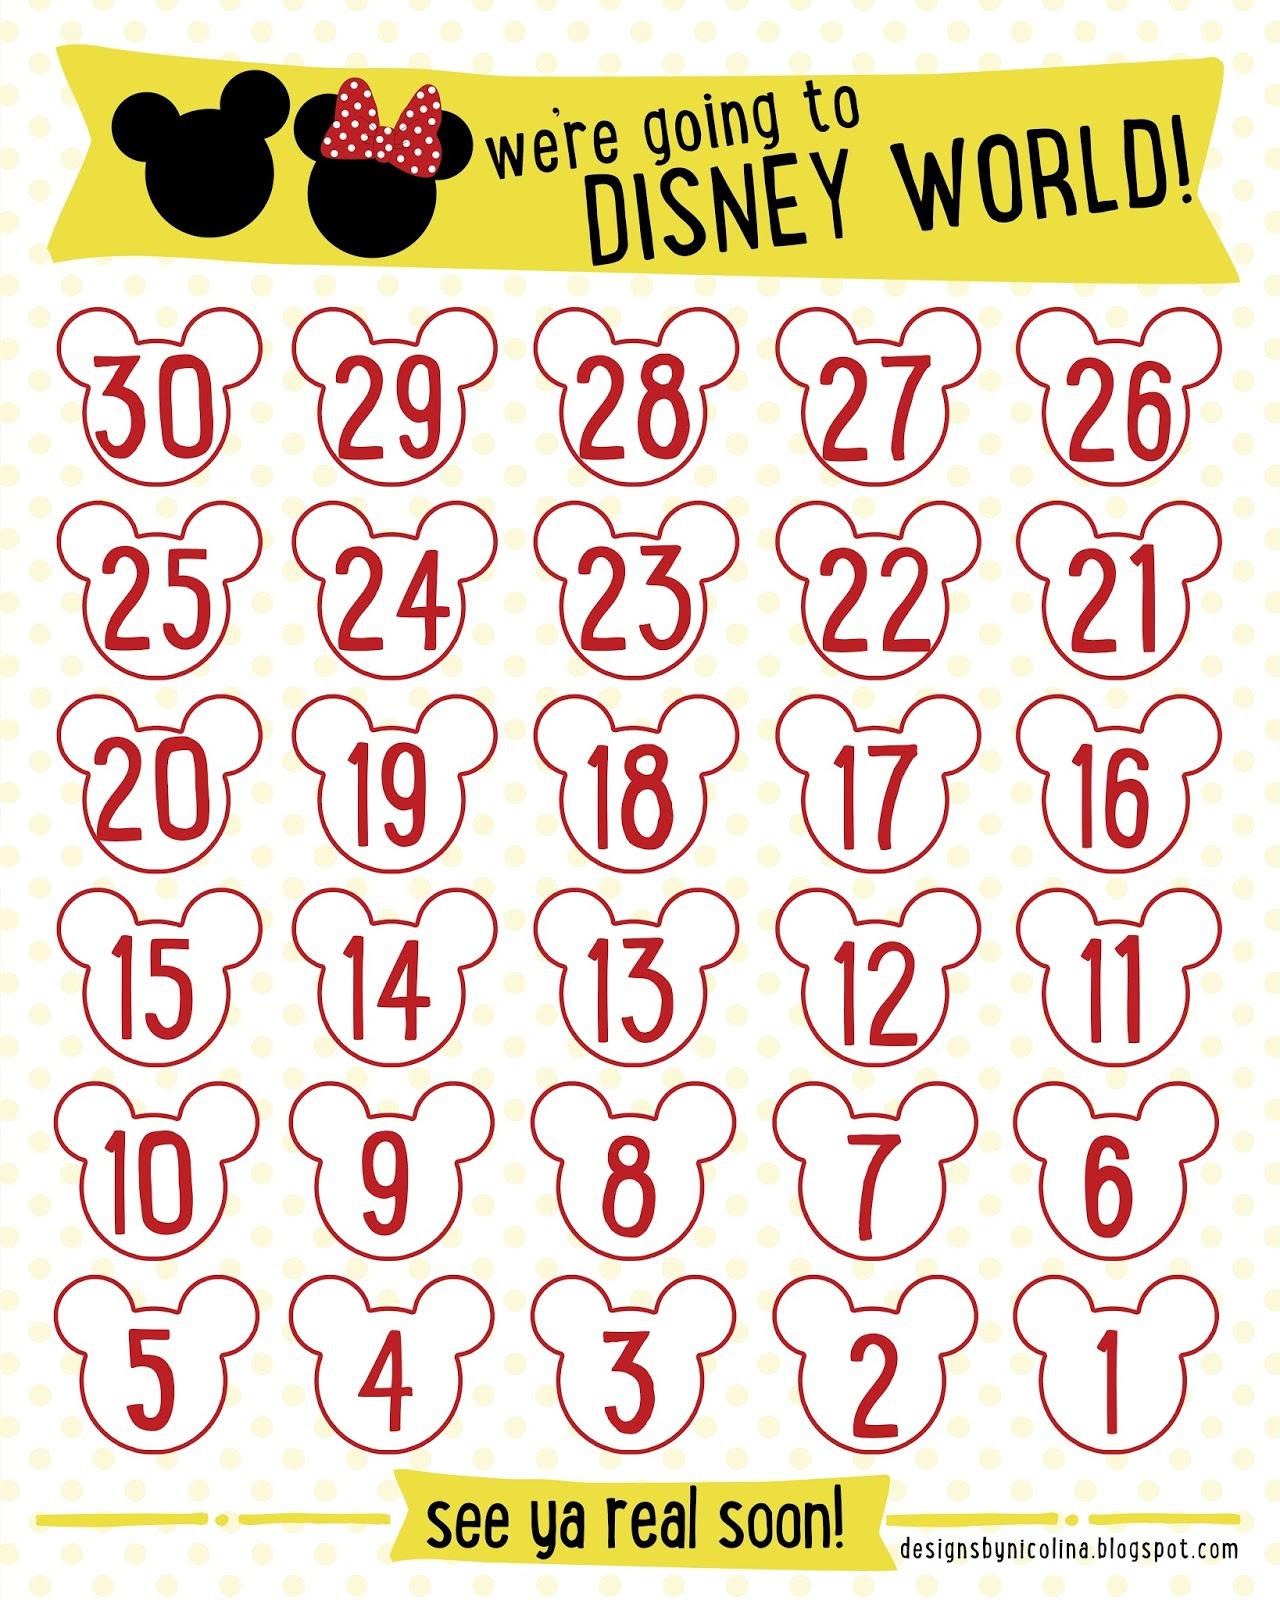 designs by nicolina: DISNEY COUNTDOWN! /// FREE PRINTABLE ///